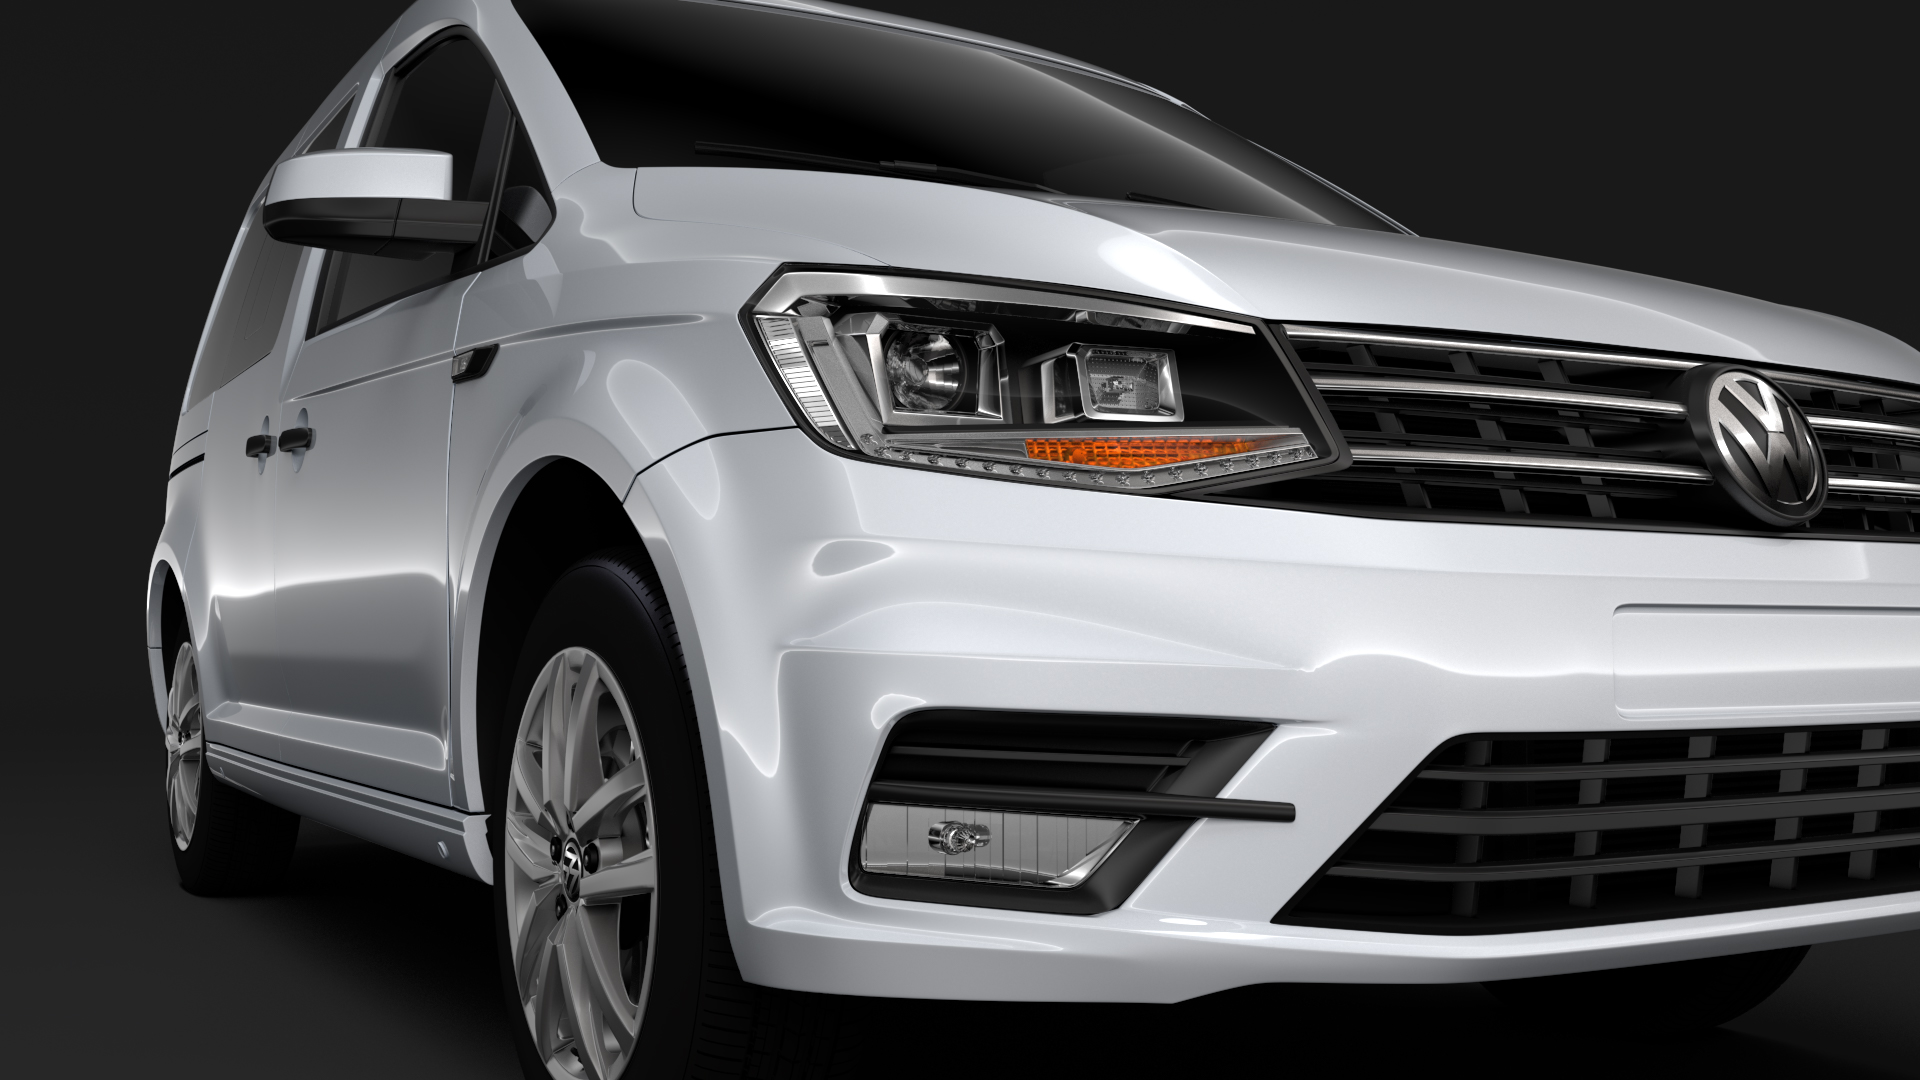 volkswagen caddy 2018 3d model max fbx c4d lwo ma mb hrc xsi obj 283801